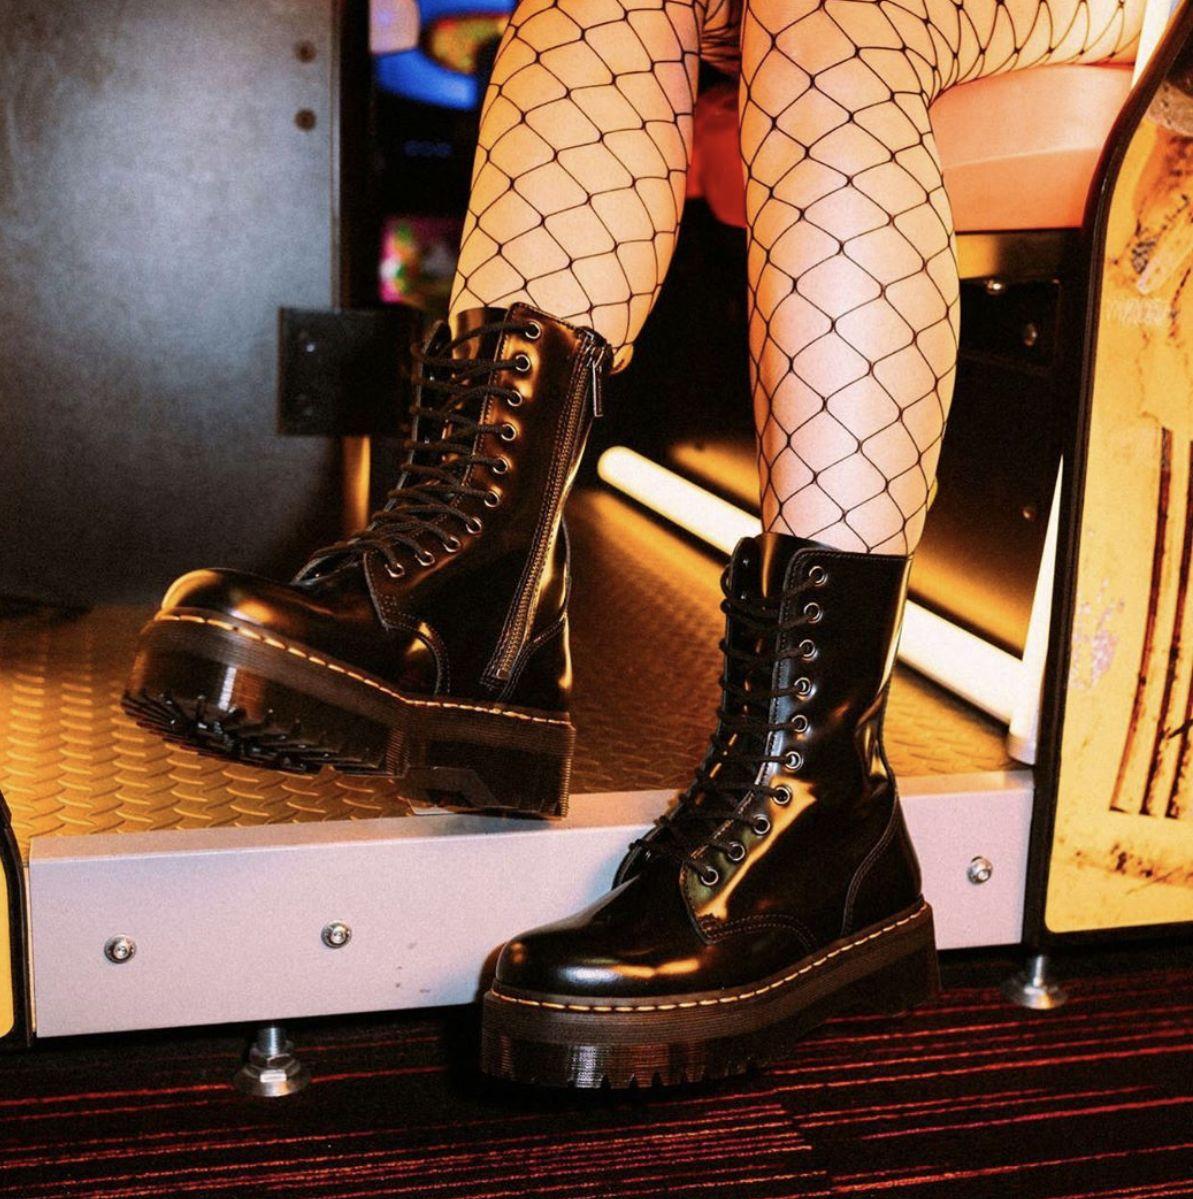 ▷ Outfits botas militares plataforma mujer - Looks 【DR MARTENS】   Botas  militares, Botas militares mujer, Dr. martens